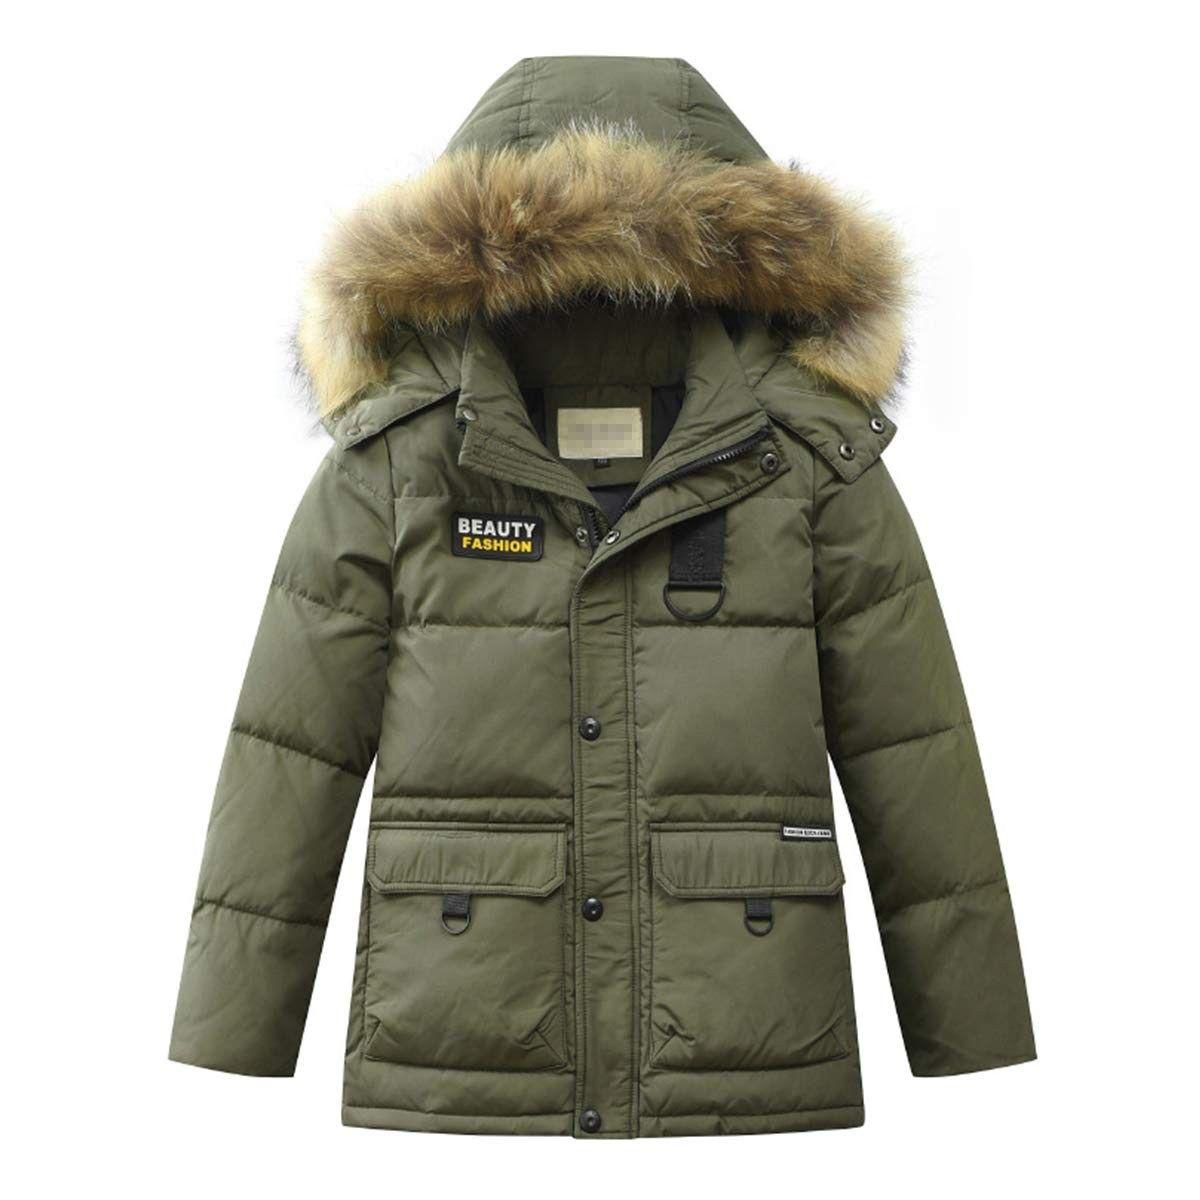 Boys Kids Winter Hooded Down Coat Puffer Jacket For Big Boys Mid Long Army Green Cu18i05ha4x Boys Winter Coats Boys Winter Jackets Winter Jackets [ 1200 x 1200 Pixel ]